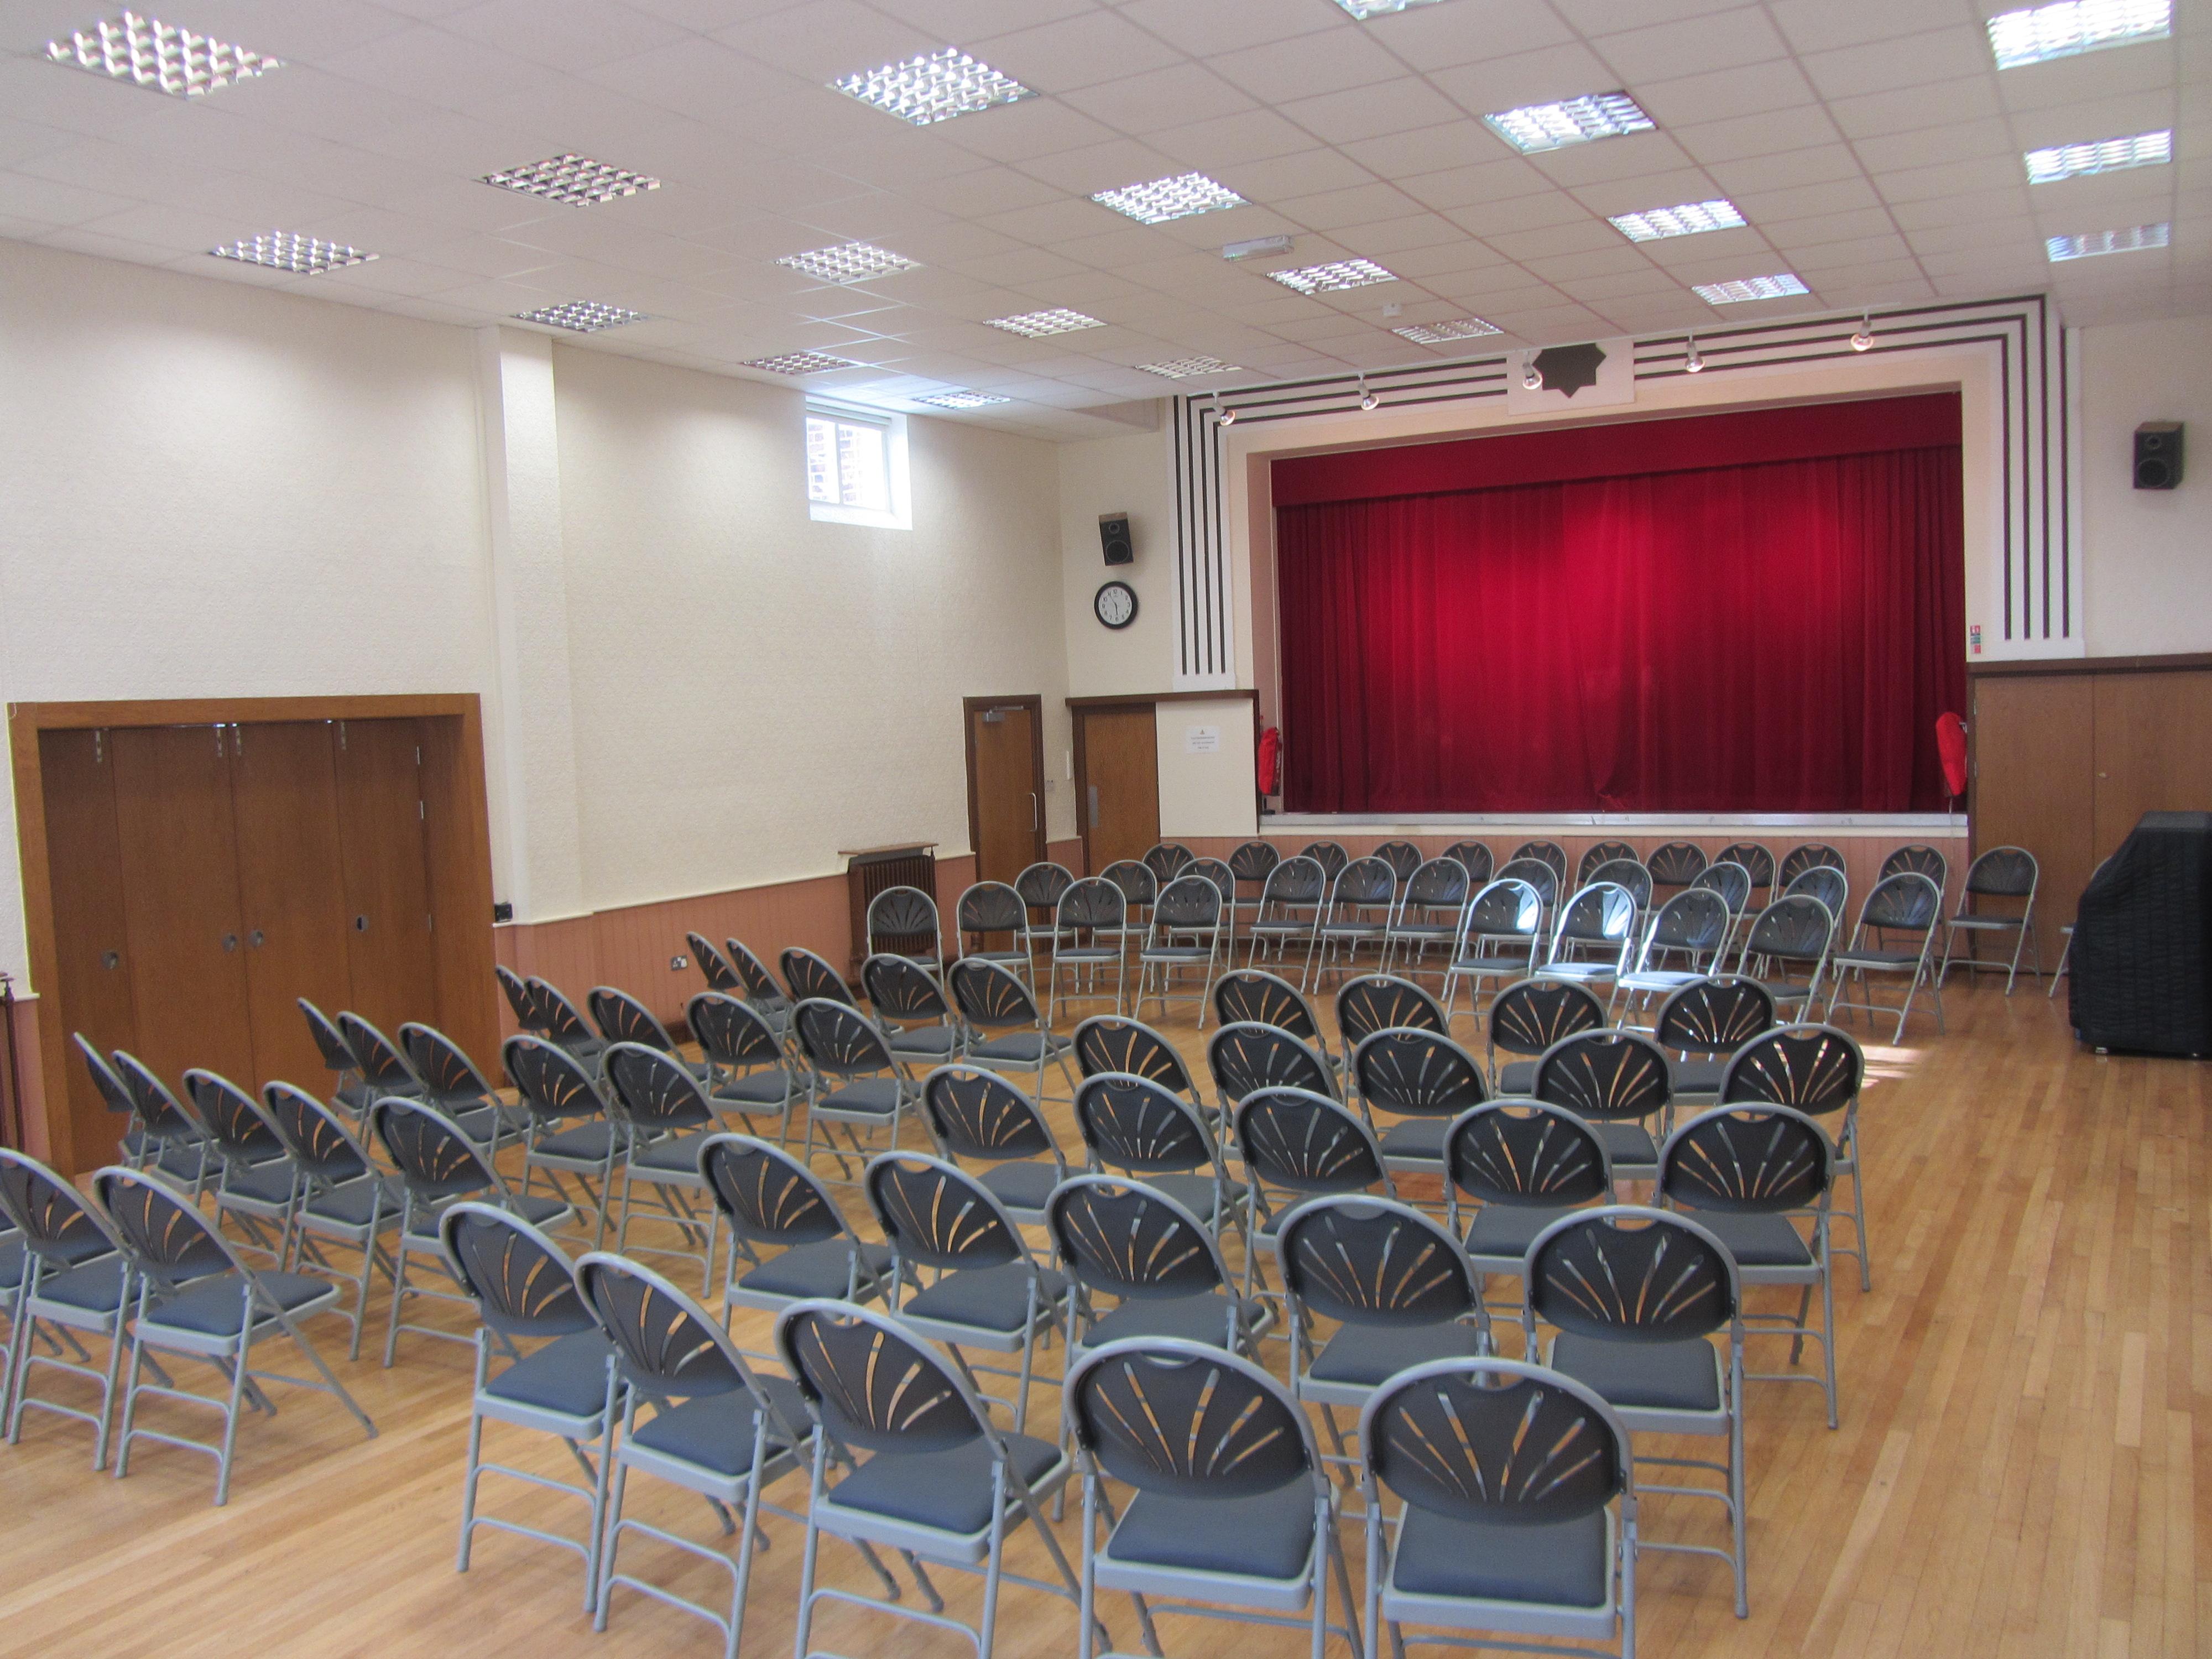 Concert layout